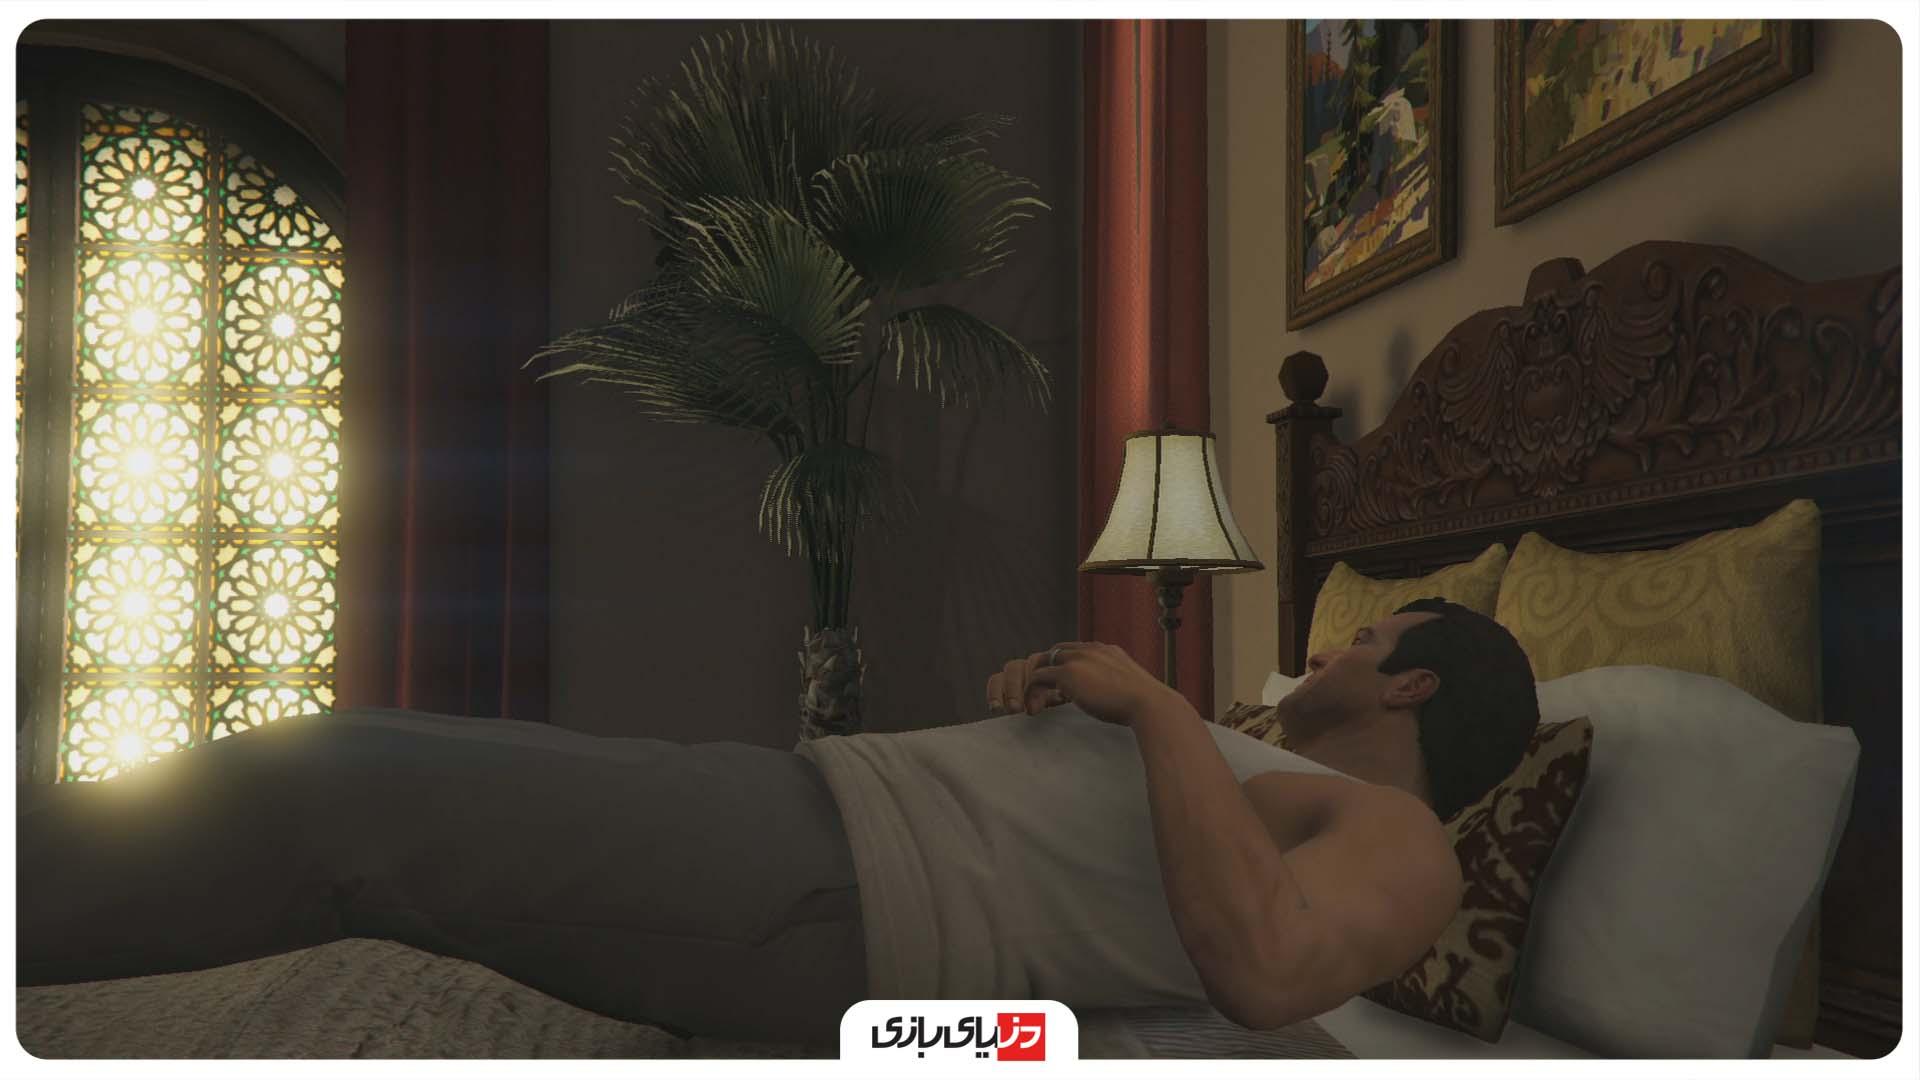 Sleeping in GTA V